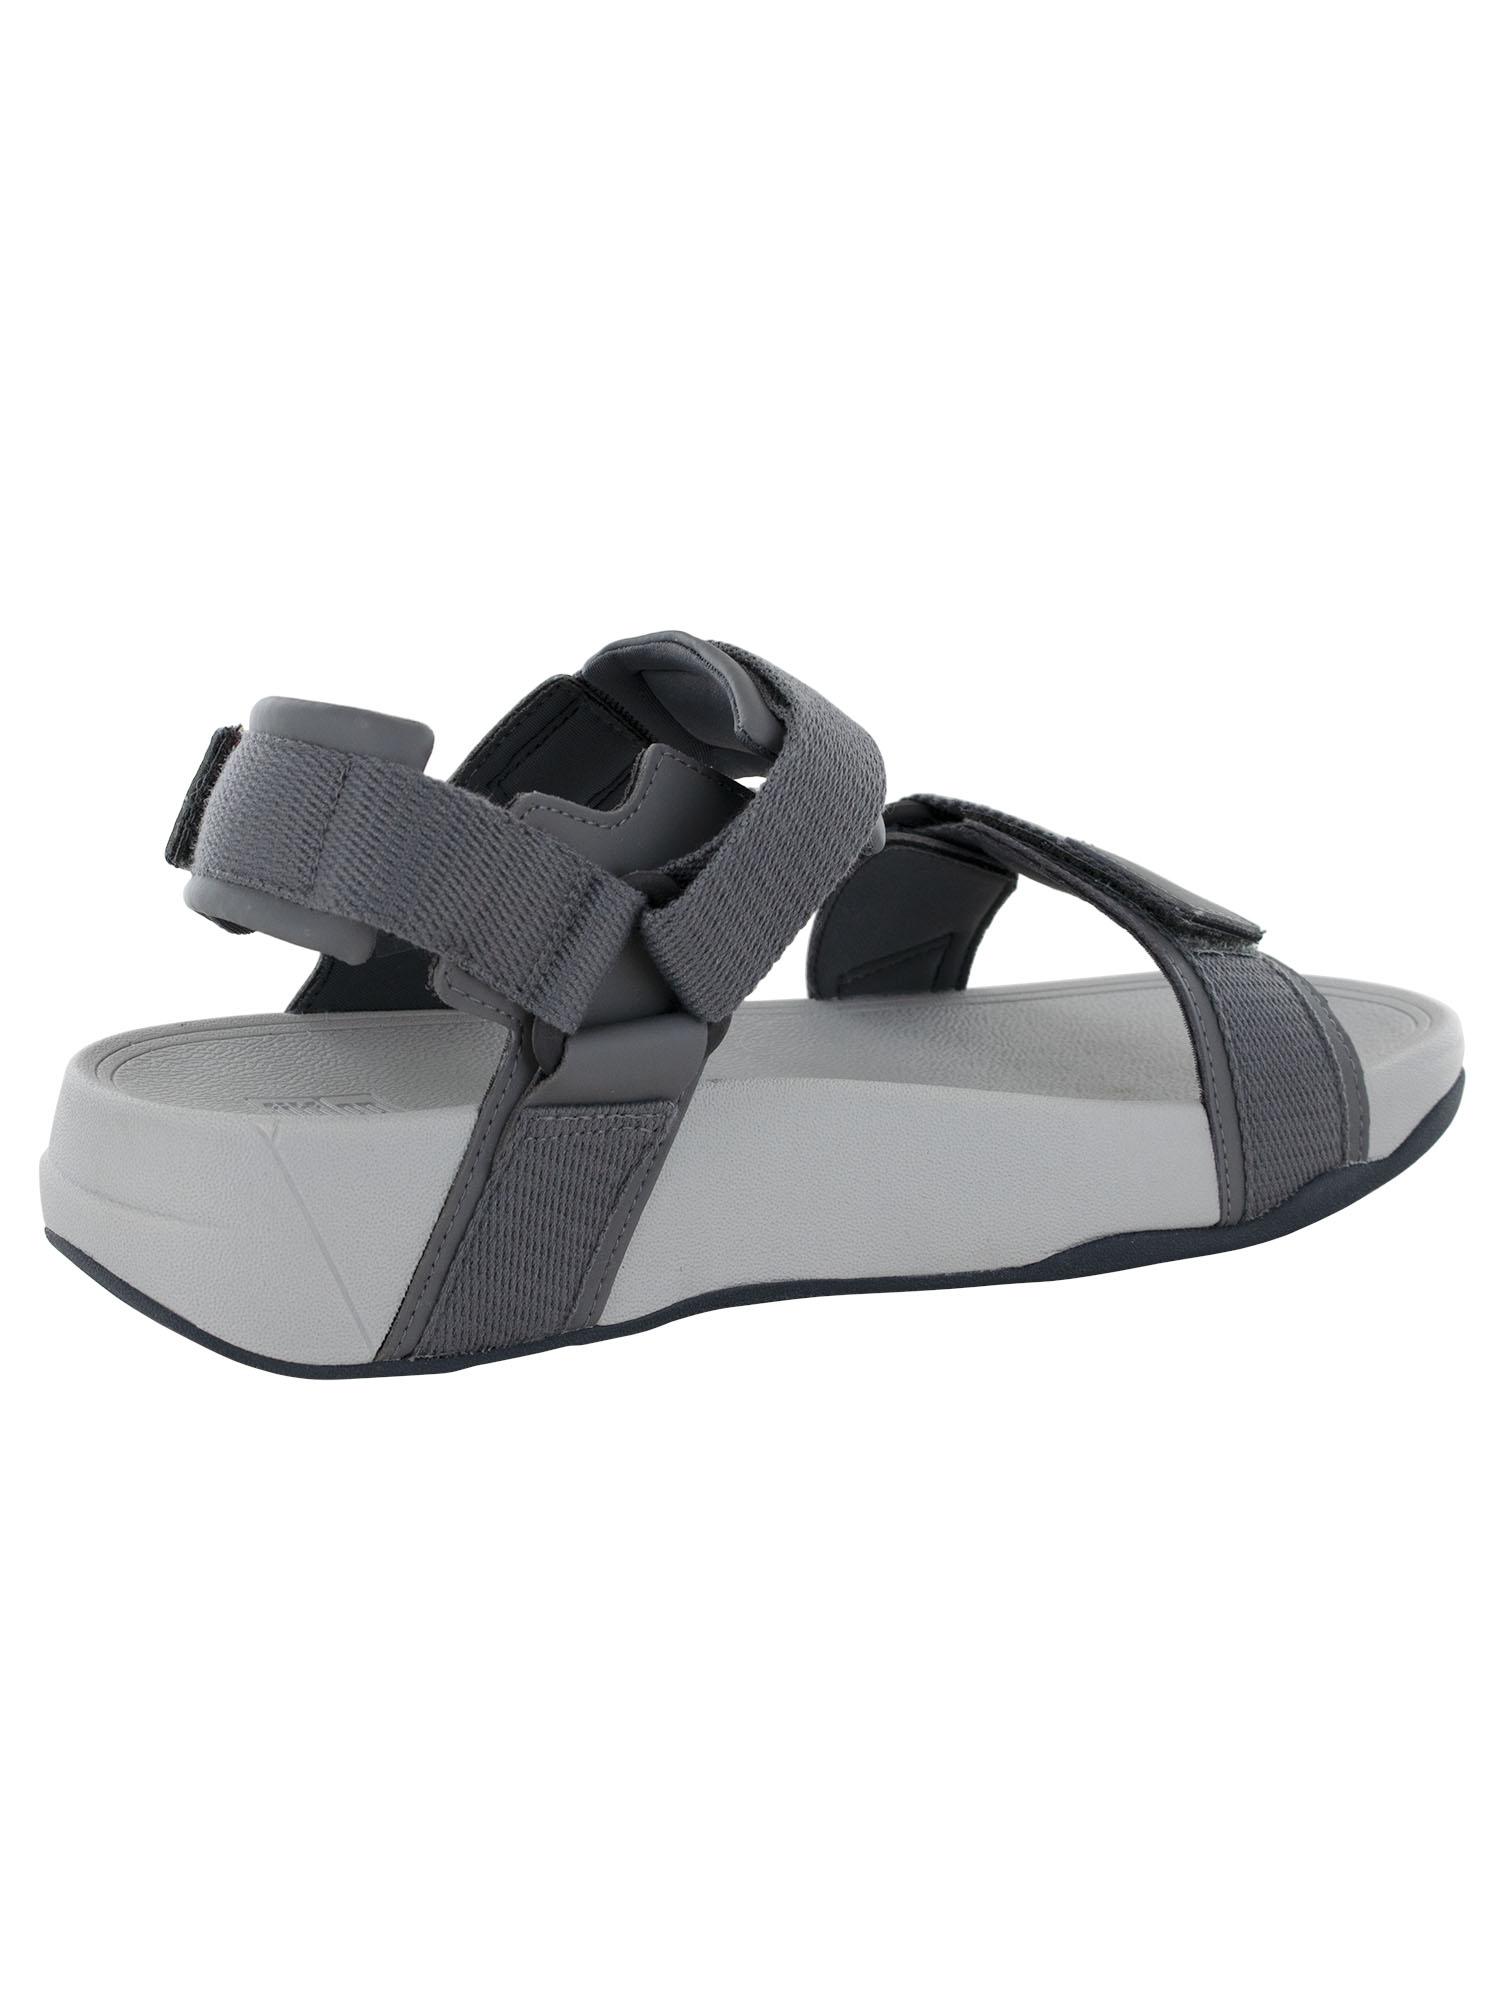 thumbnail 7 - Fitflop-Mens-Ryker-Webbing-Athletic-Sandal-Shoes